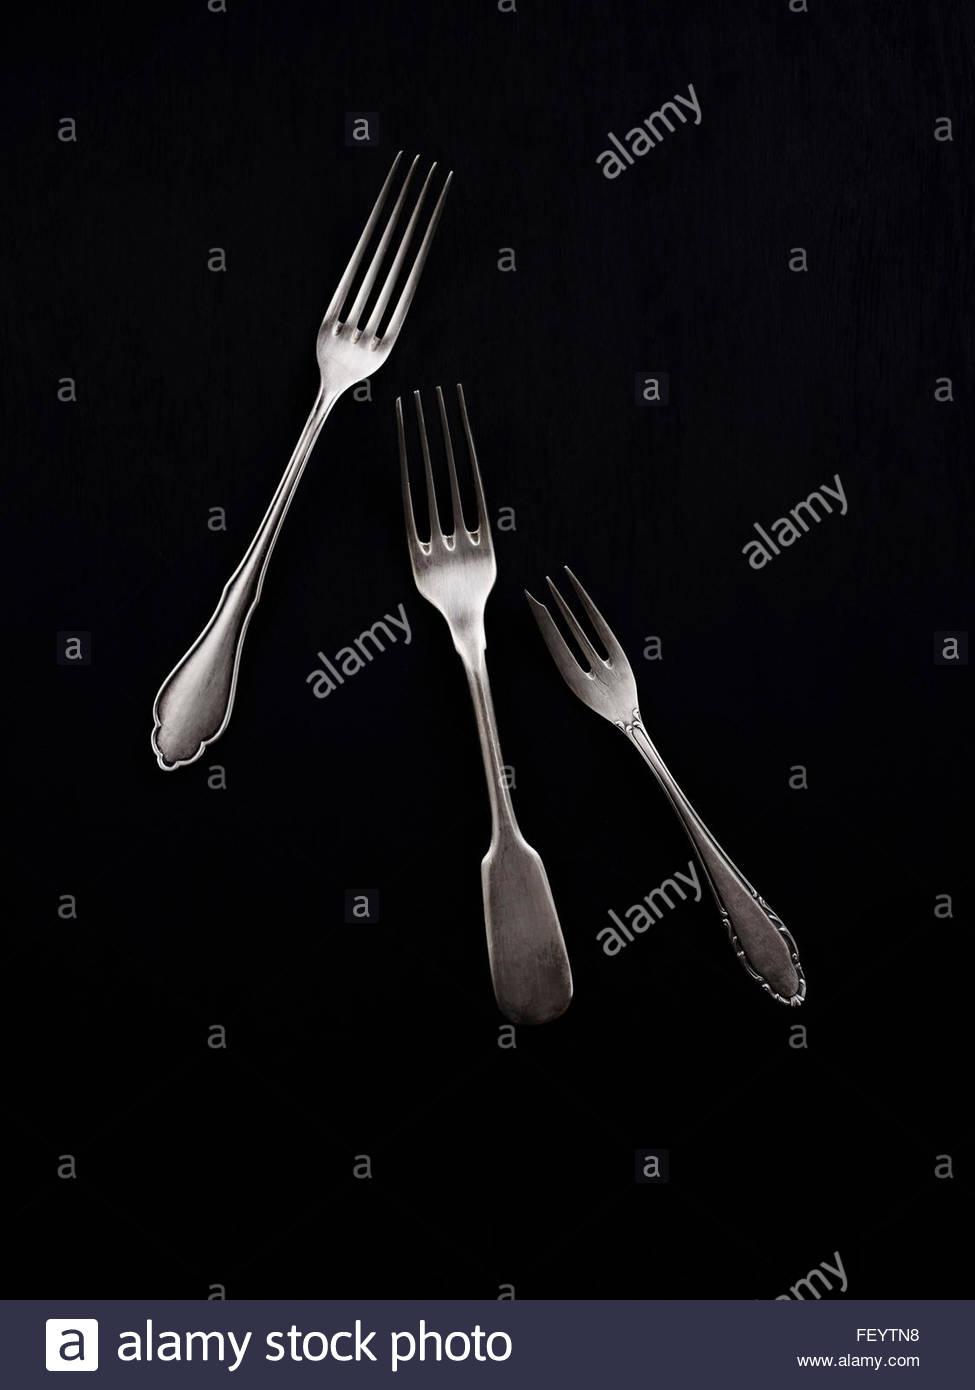 Three antique forks on black background - Stock Image